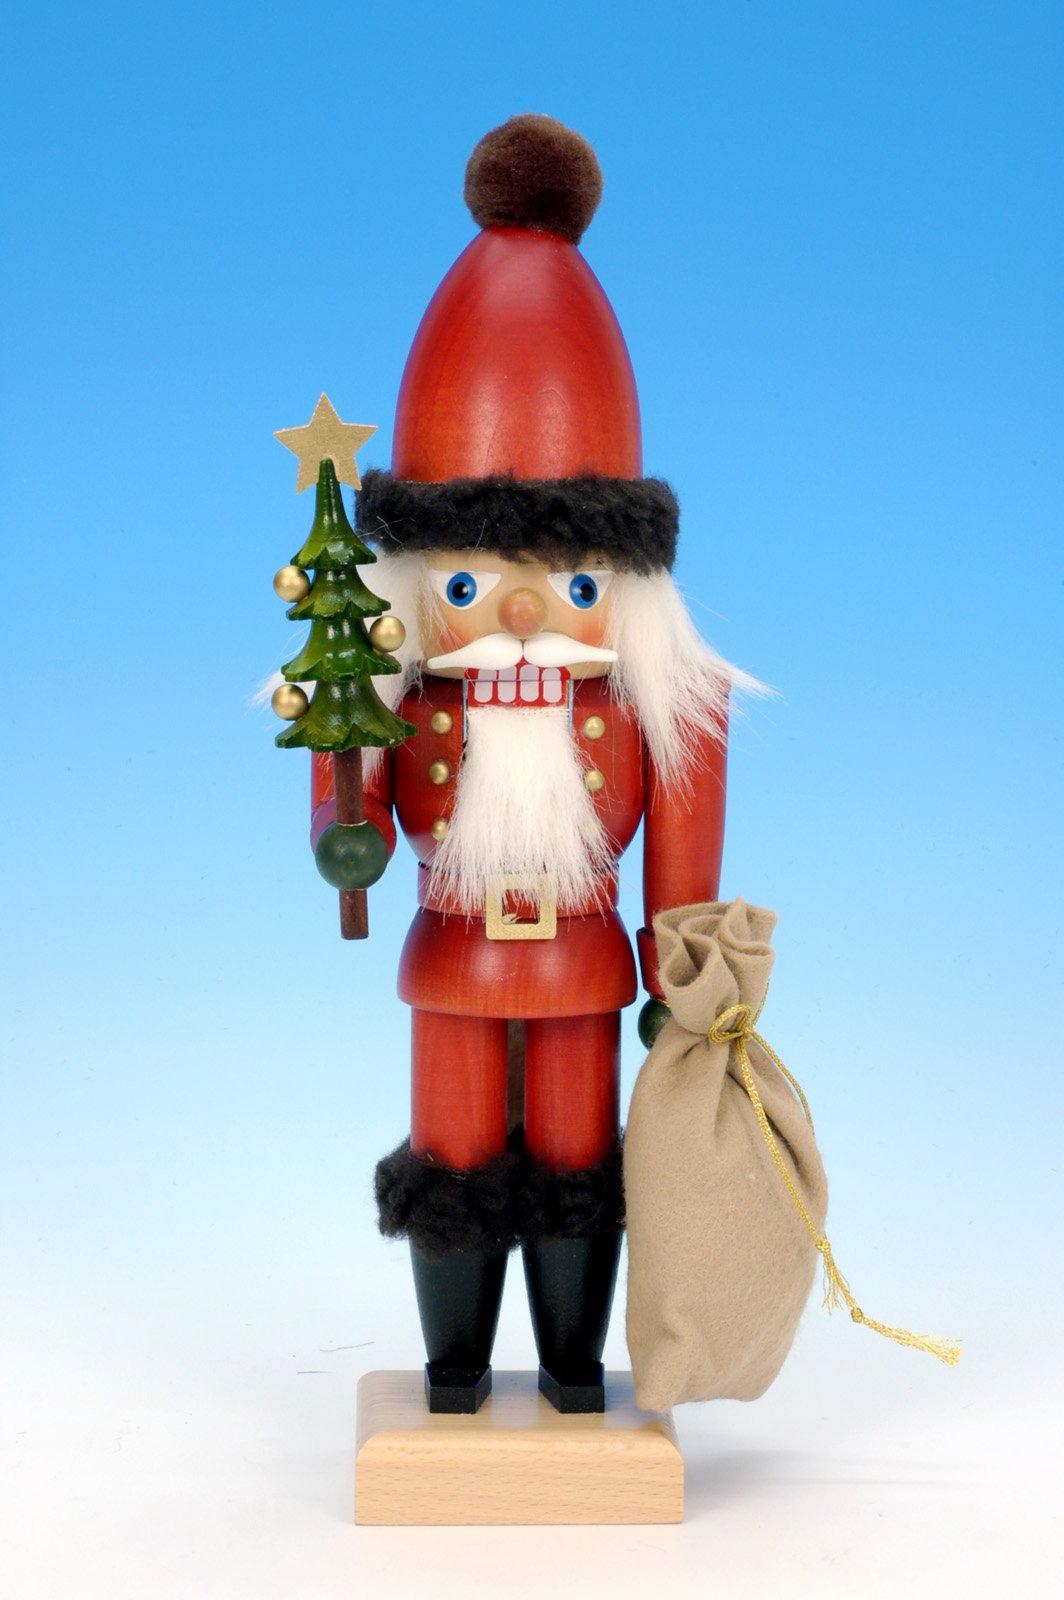 German Christmas Nutcracker Santa Claus - 30,0 cm / 12 inches - Authentic German Erzgebirge Nutcrackers - Christian Ulbricht